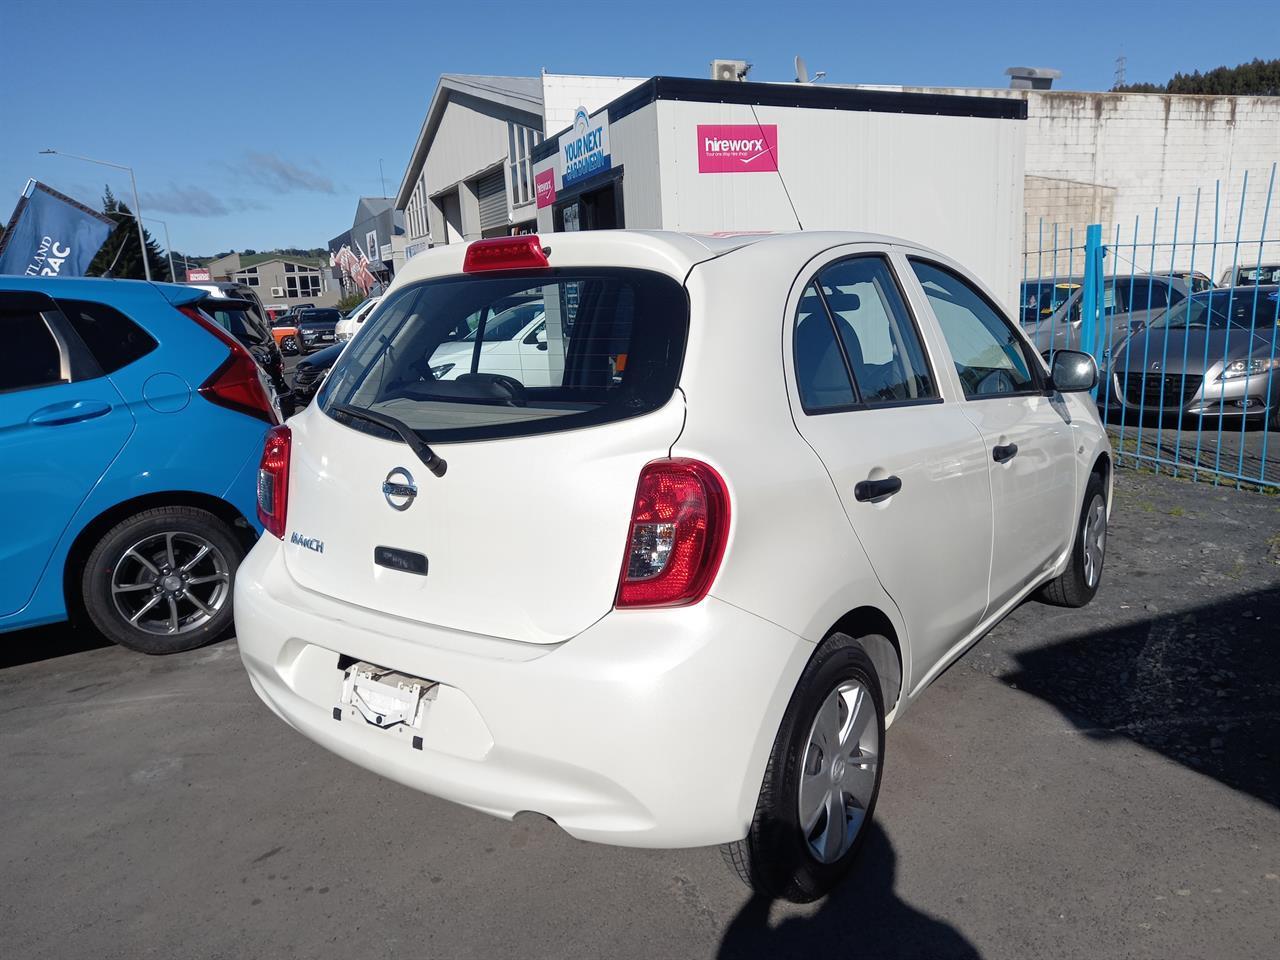 image-6, 2016 Nissan March S Low Km's No Deposit Finance at Dunedin